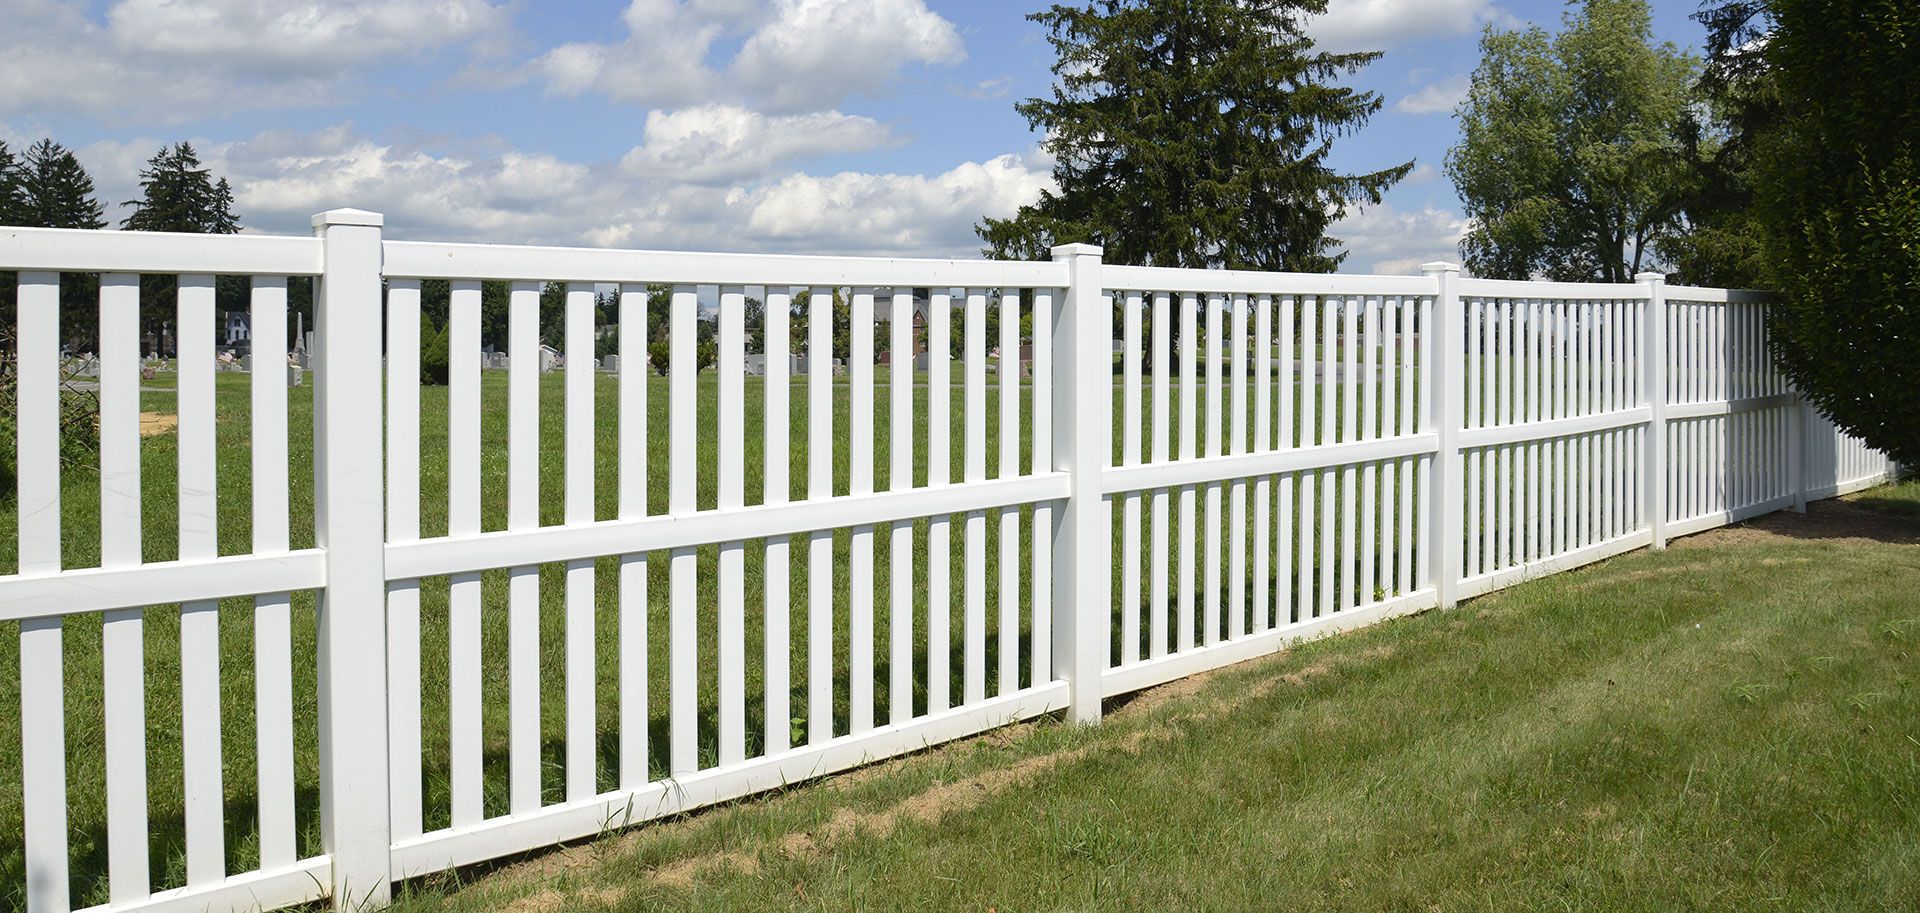 Fencing Gates Decks Patios Harker Heights TX Fence USA